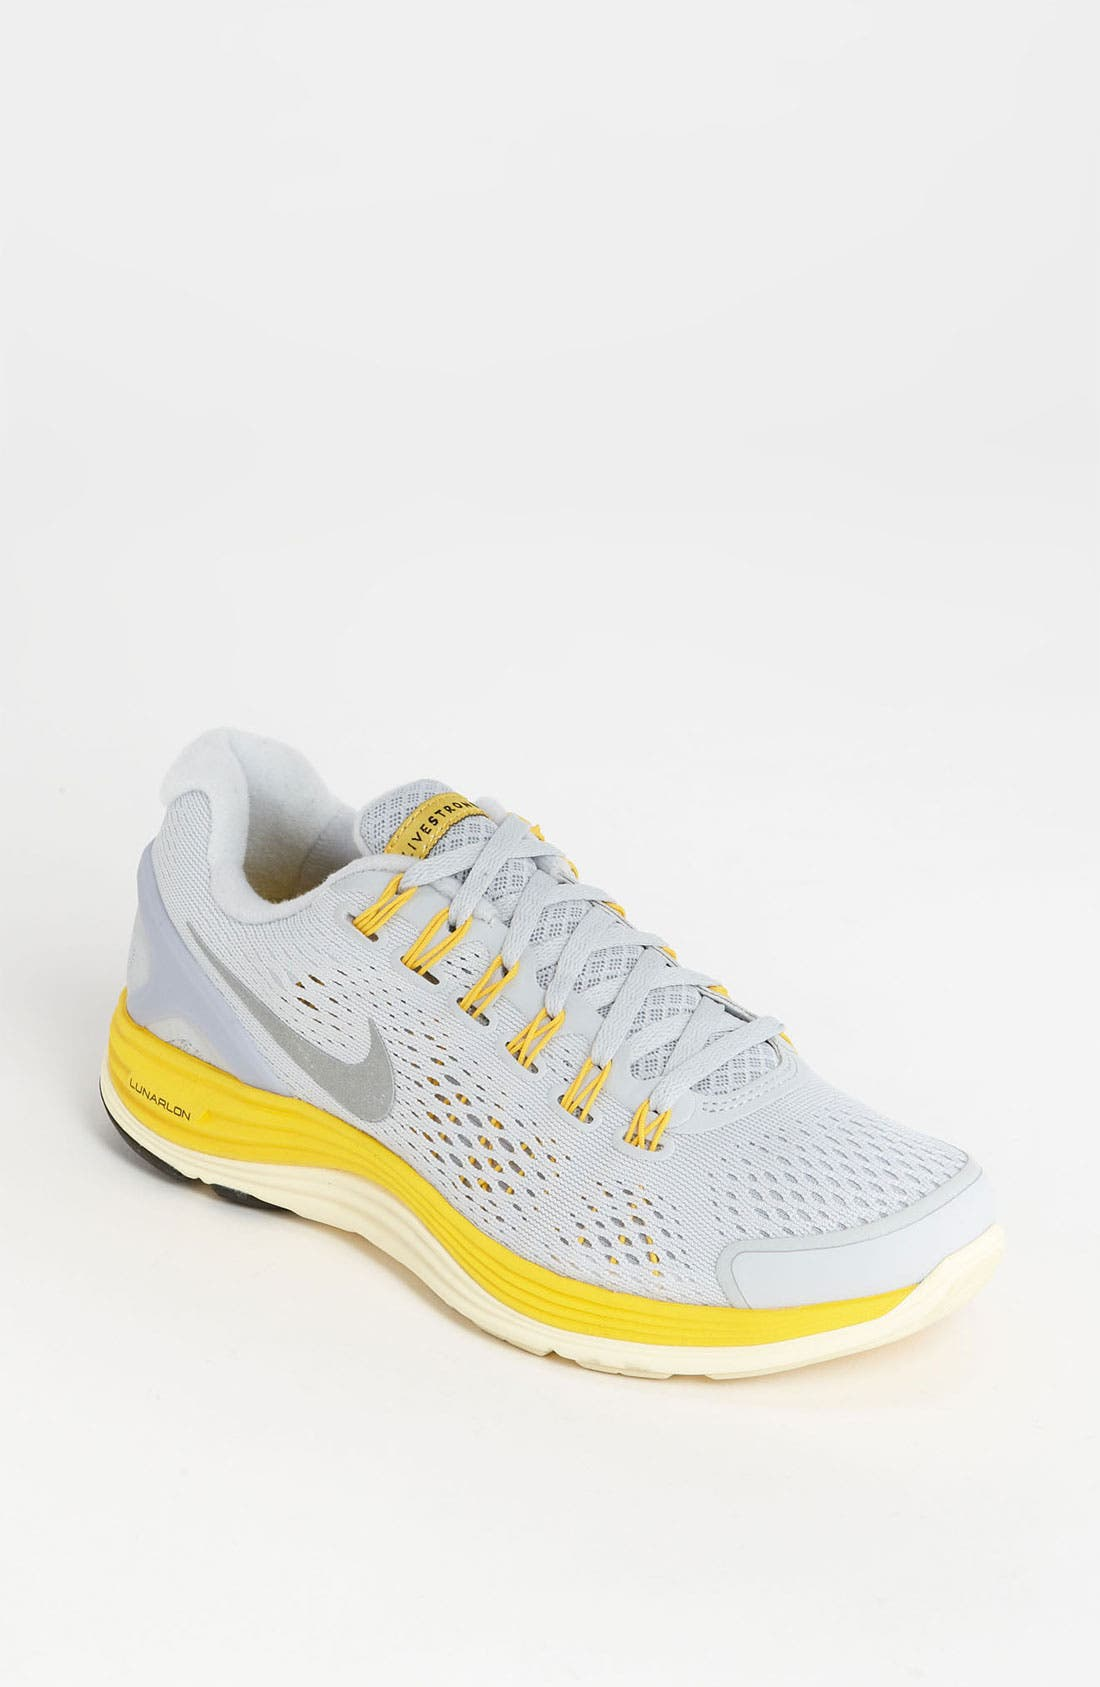 Main Image - Nike 'LunarGlide 4 Livestrong' Running Shoe (Women)